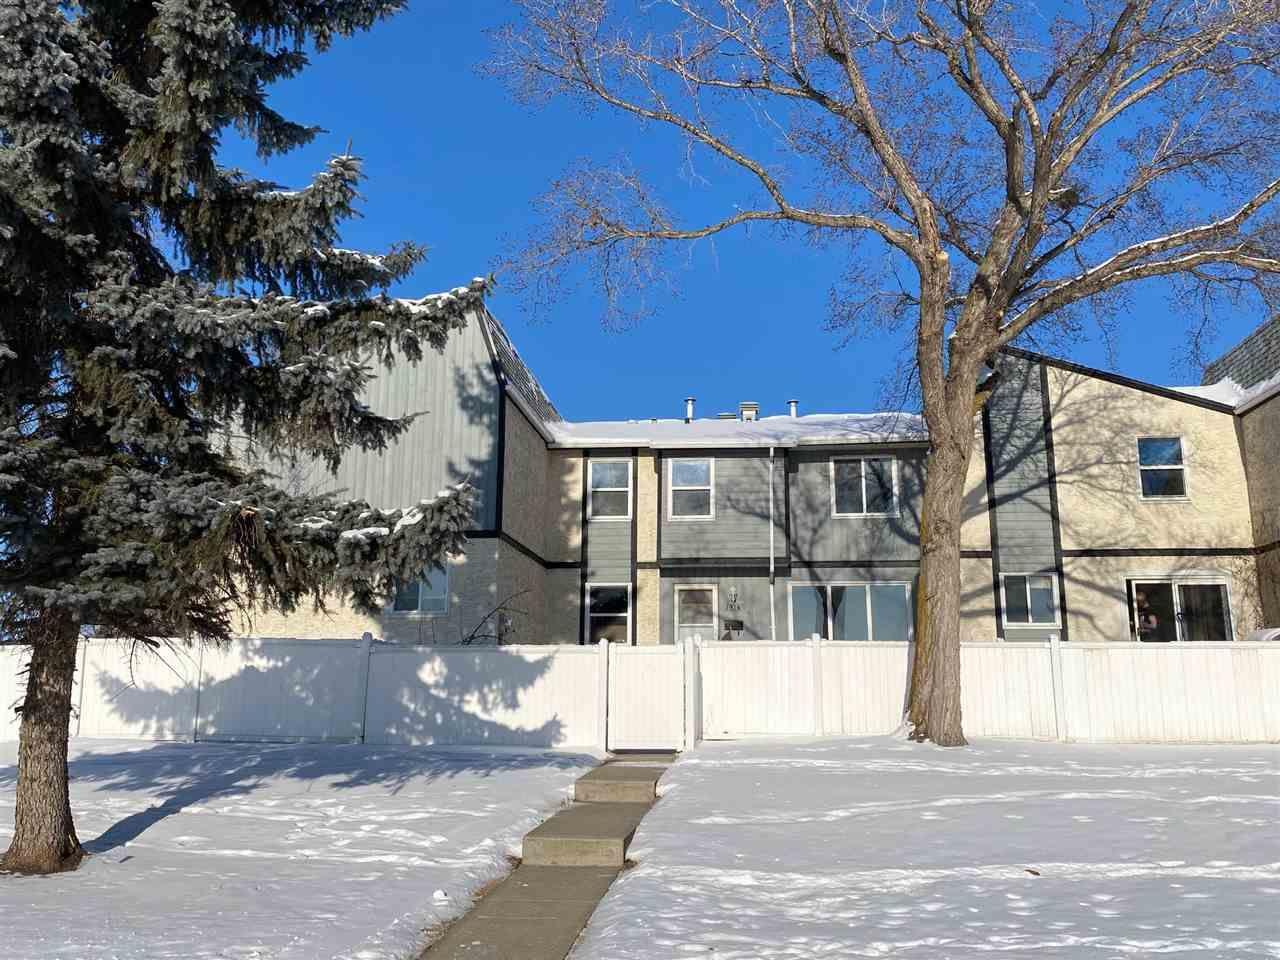 Main Photo: 191A HOMESTEAD Crescent in Edmonton: Zone 35 Townhouse for sale : MLS®# E4227788